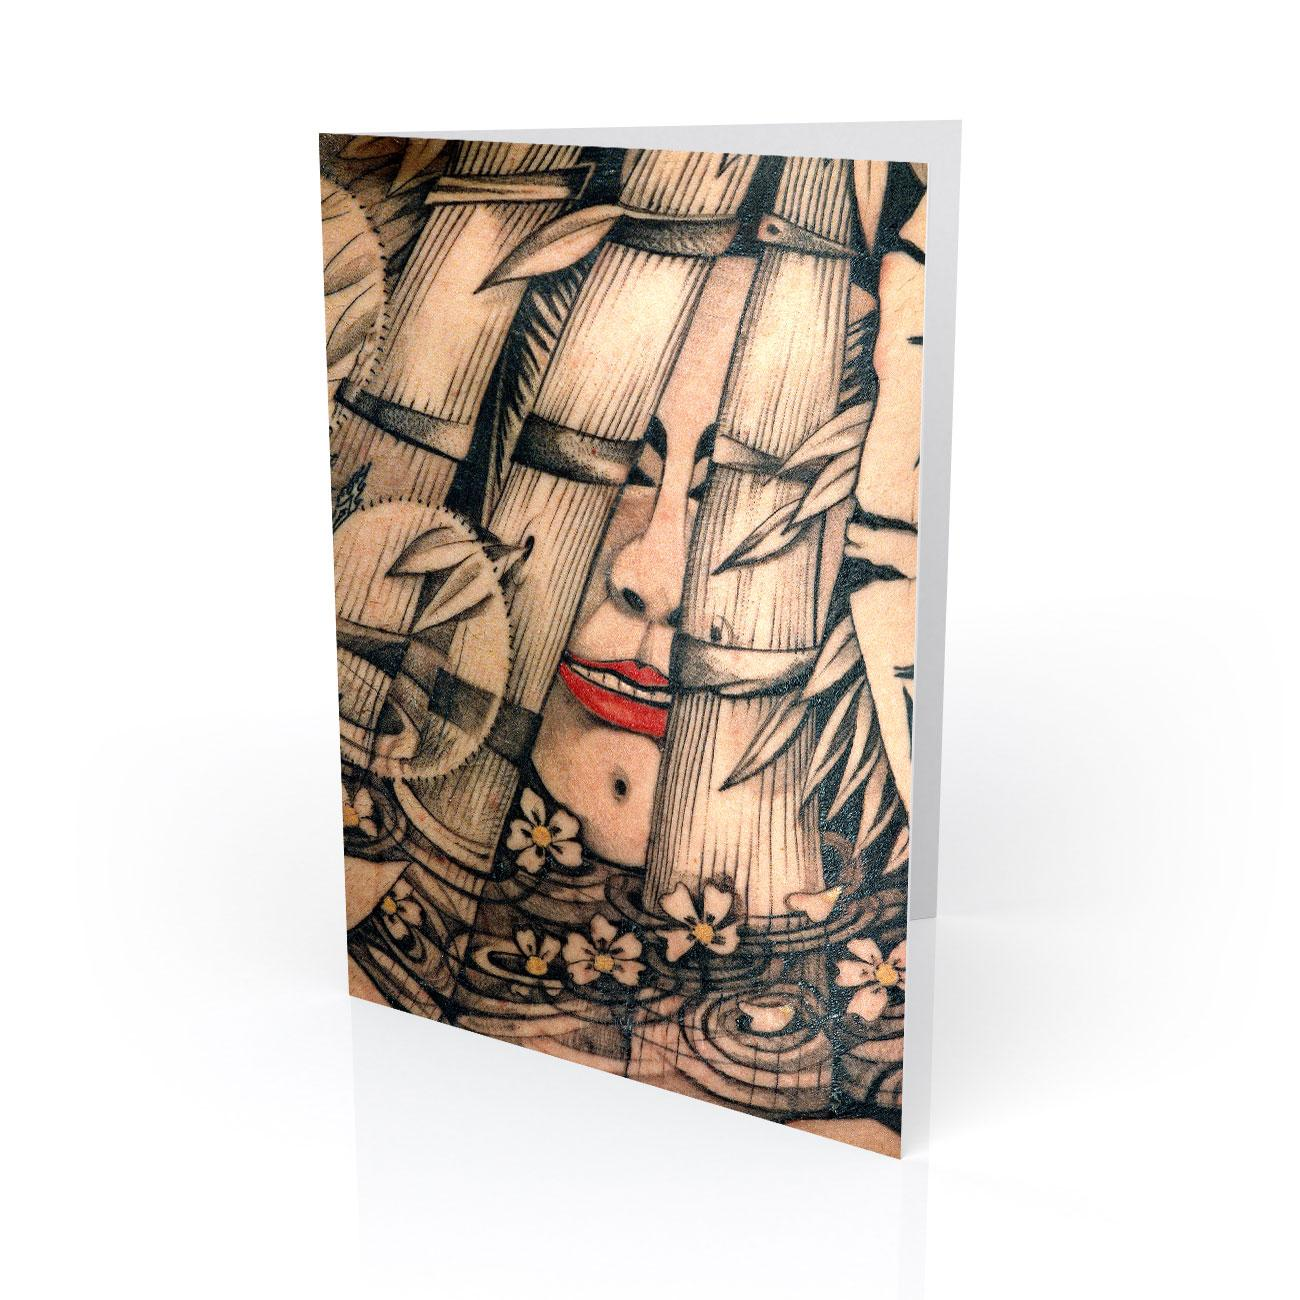 Whooo r youuu greeting card tattoo artcard whooo r youuu greeting card tattoo artcard m4hsunfo